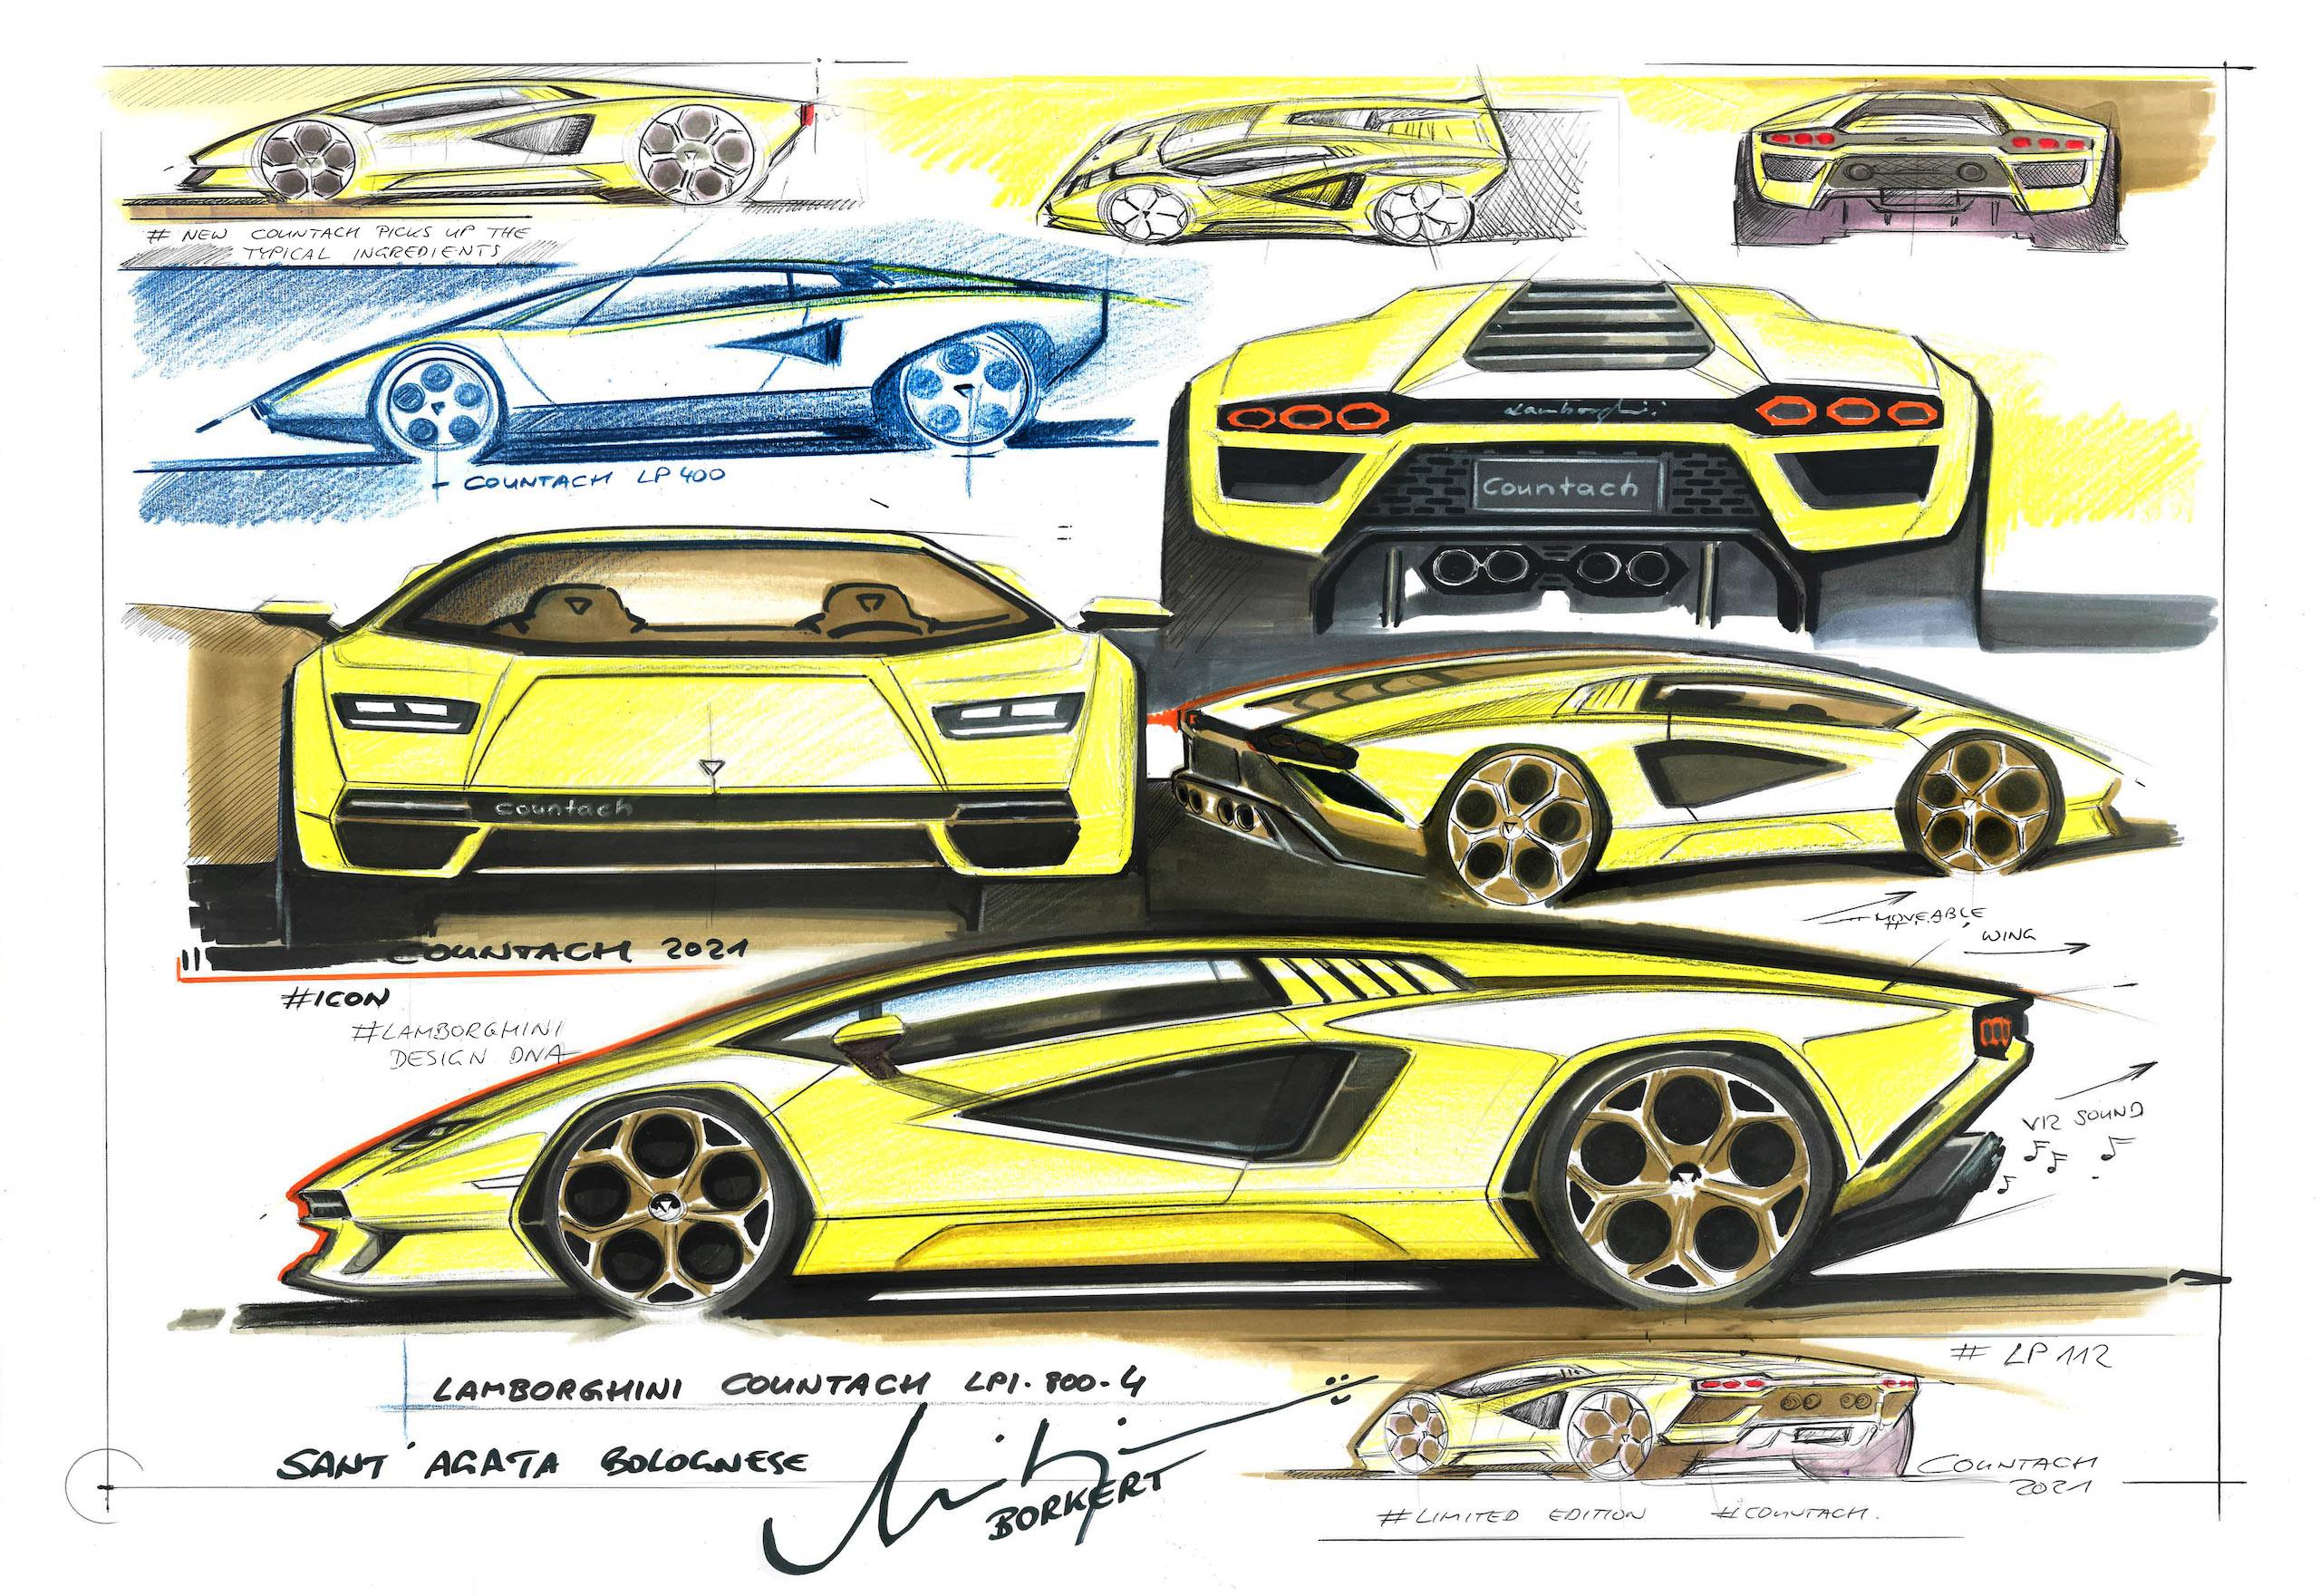 Countach LPI 800 design sketches